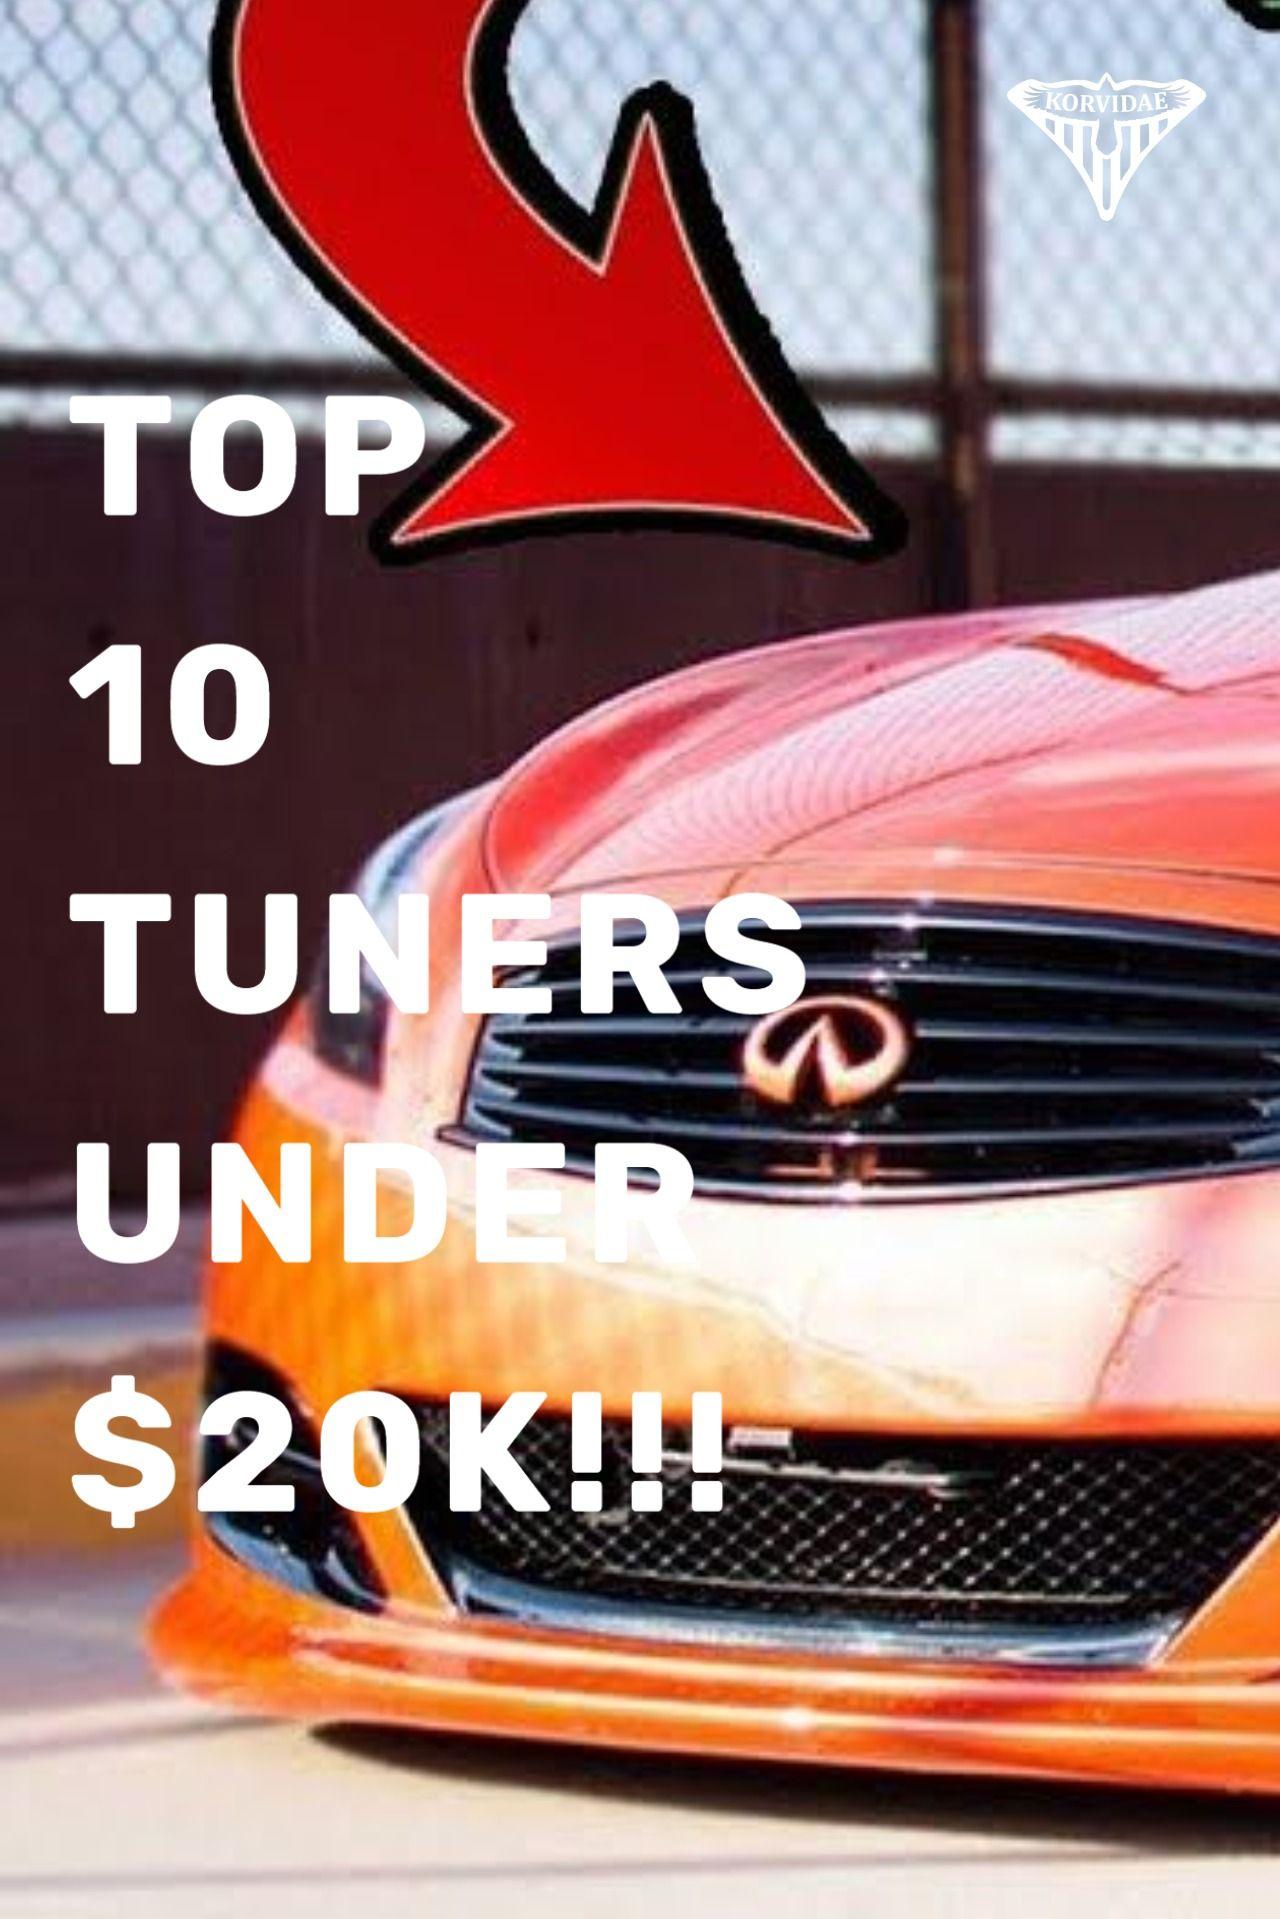 41a3cba4512dd129729081a80b9378ad - How Much Is It To Get Your Car Tuned